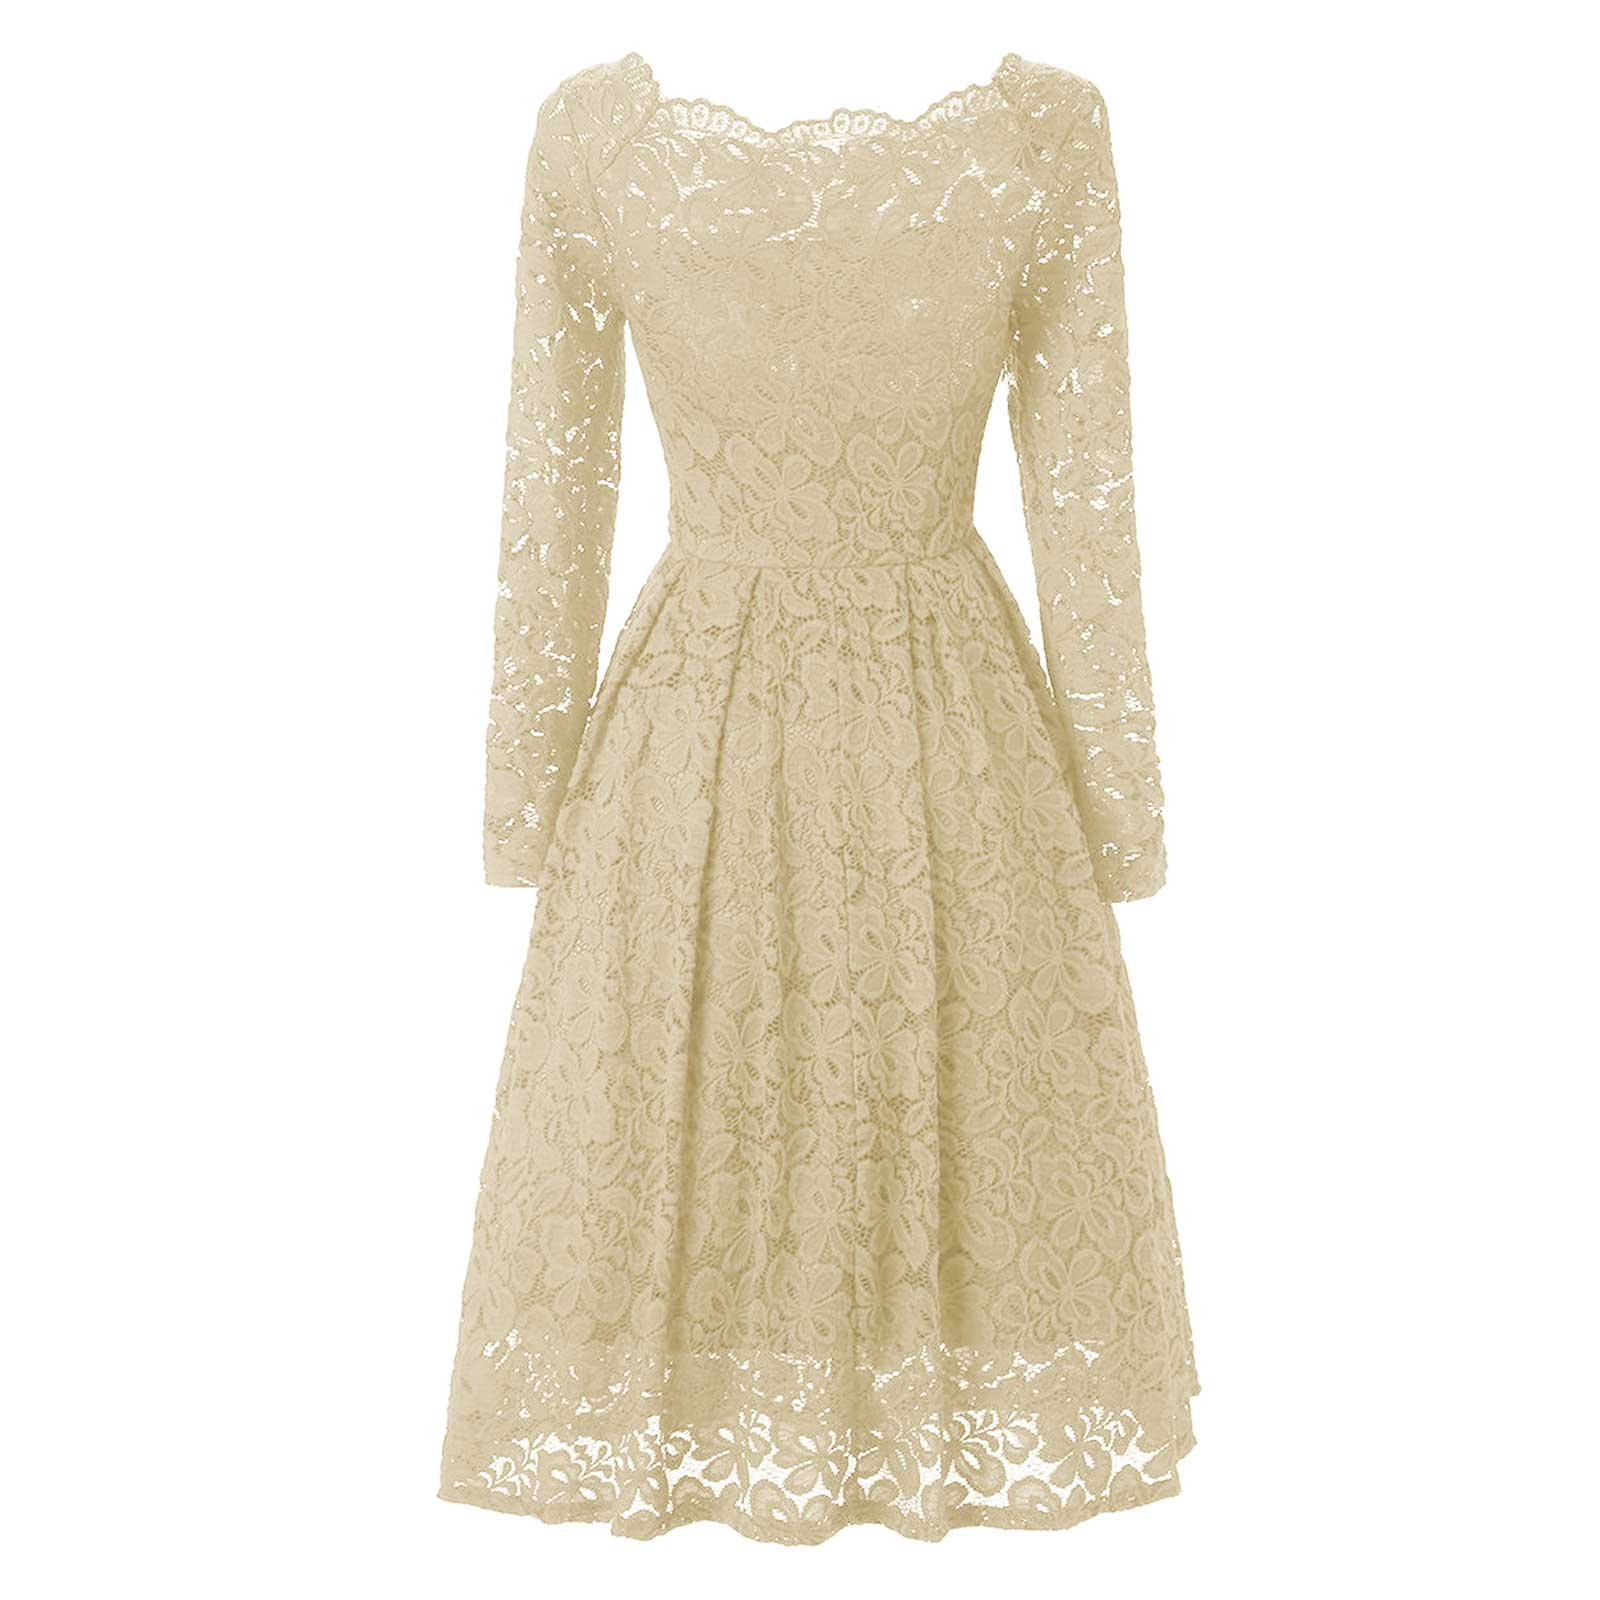 Sexy Floral Lace Off Shoulder Vintage Party Prom A-Line Dress ...